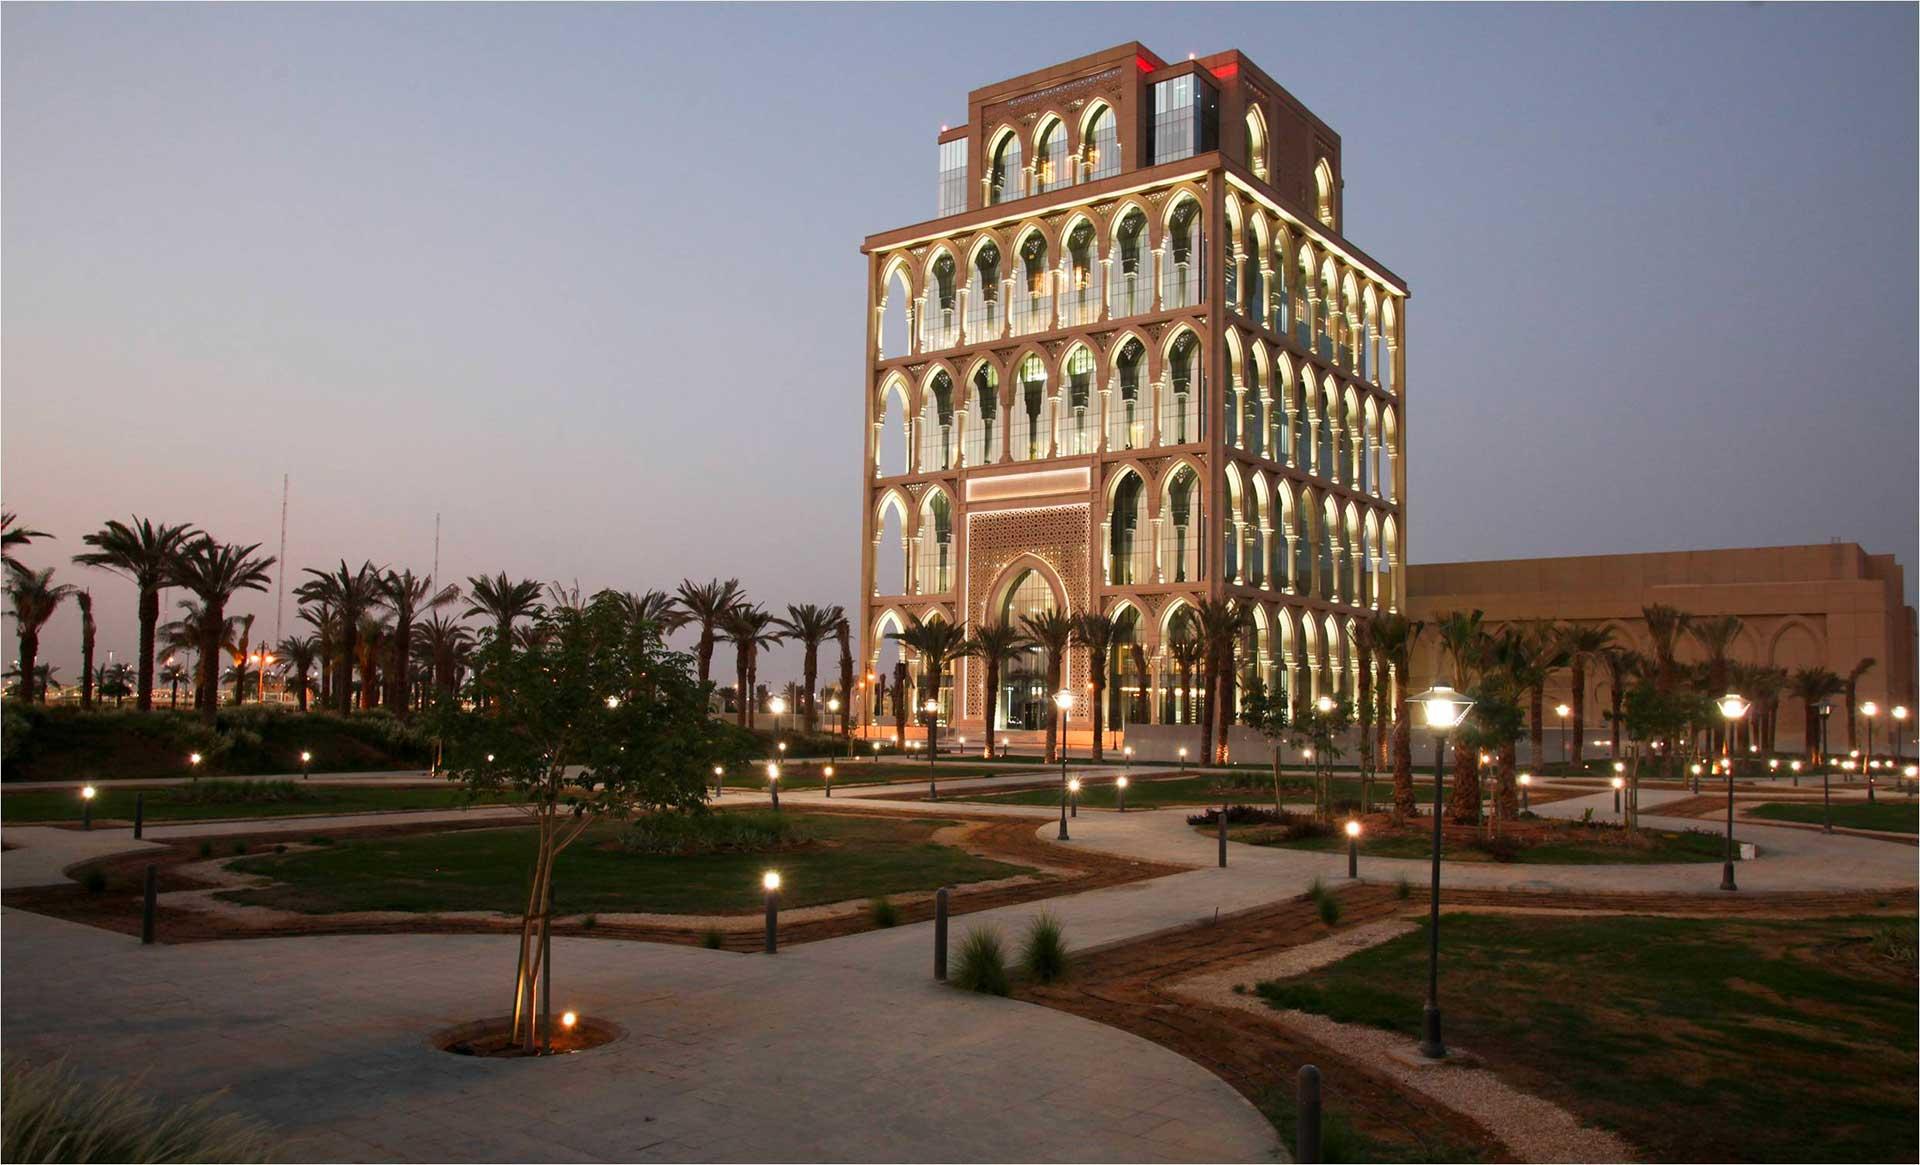 King Saud Bin Abdulaziz University Riyadh 1